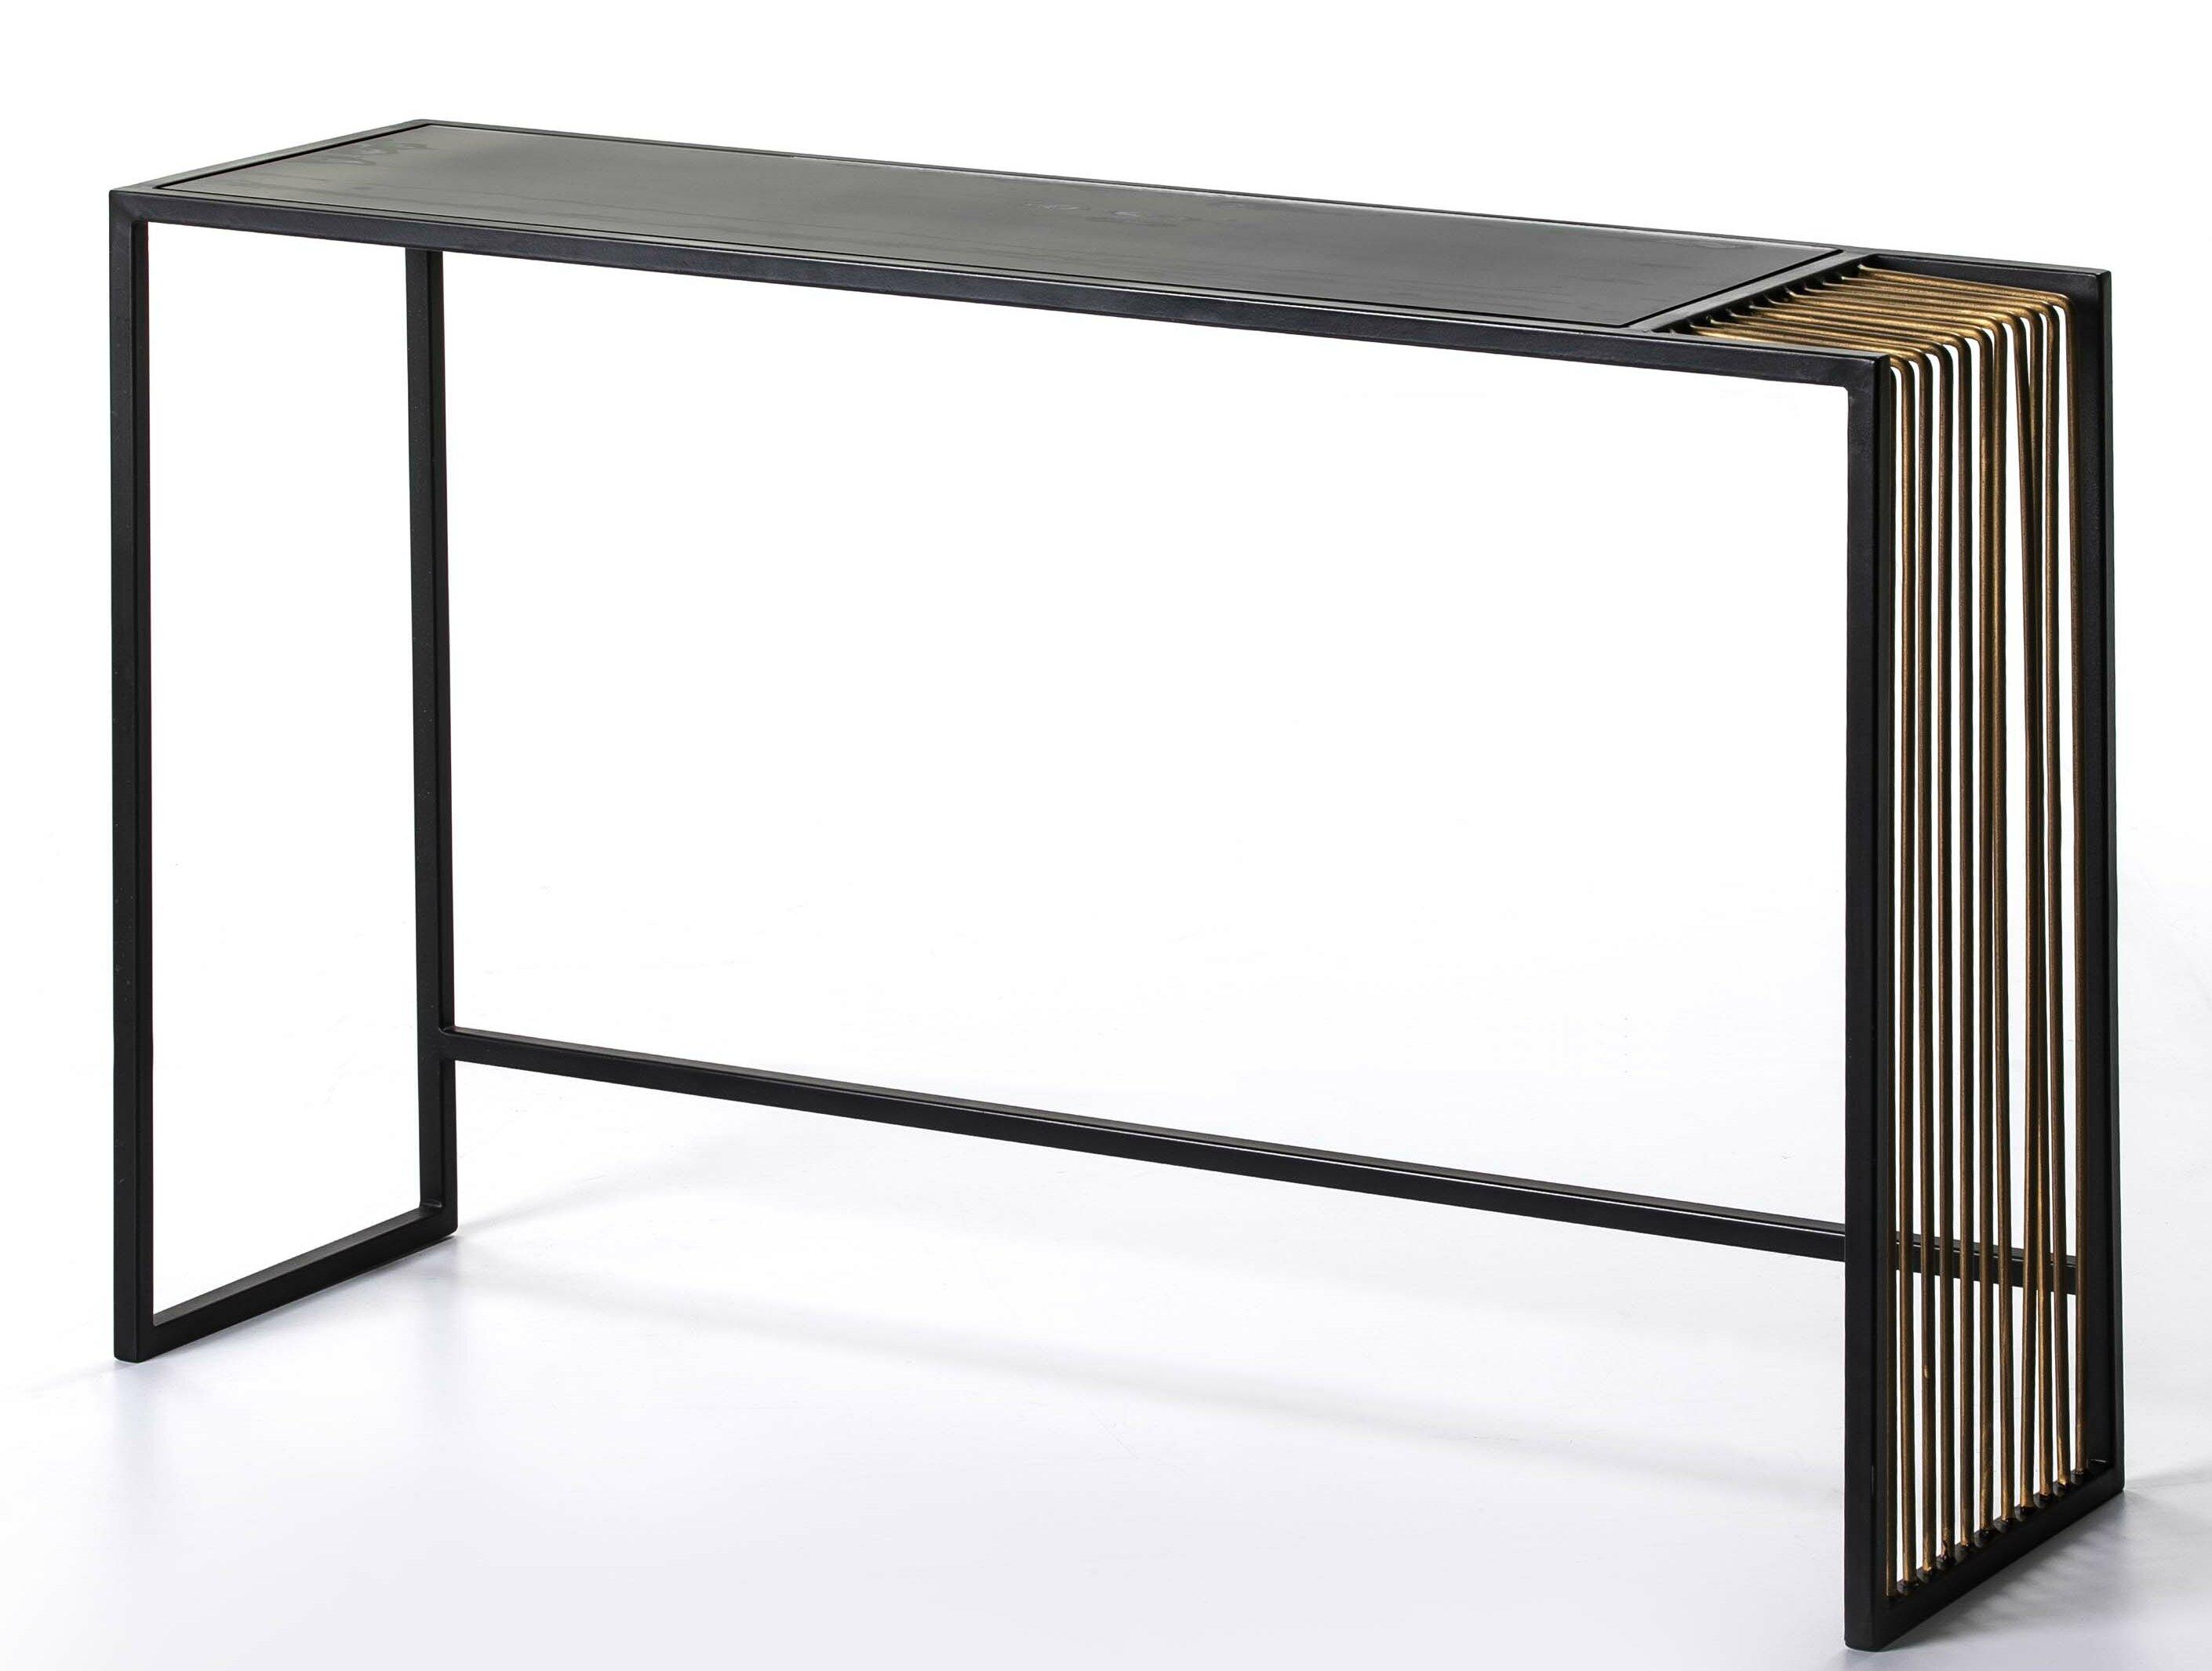 Ebern Designs Hetherington Console Table Wayfair Co Uk